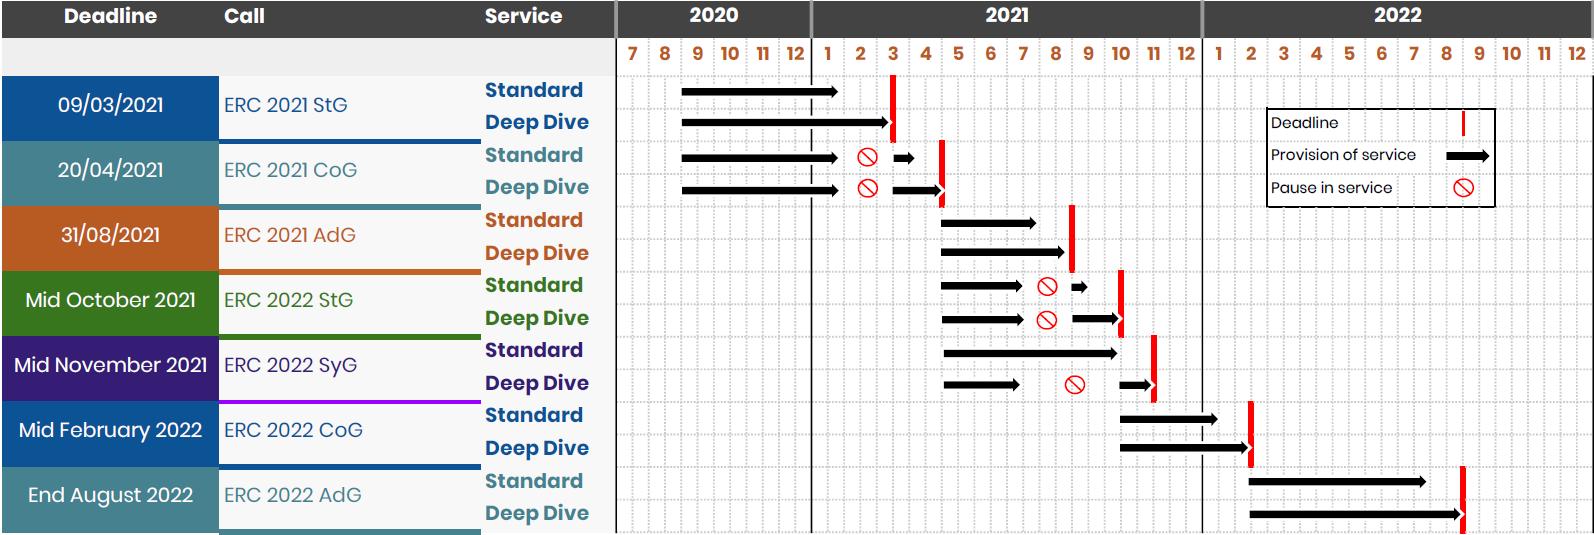 Services Timeline